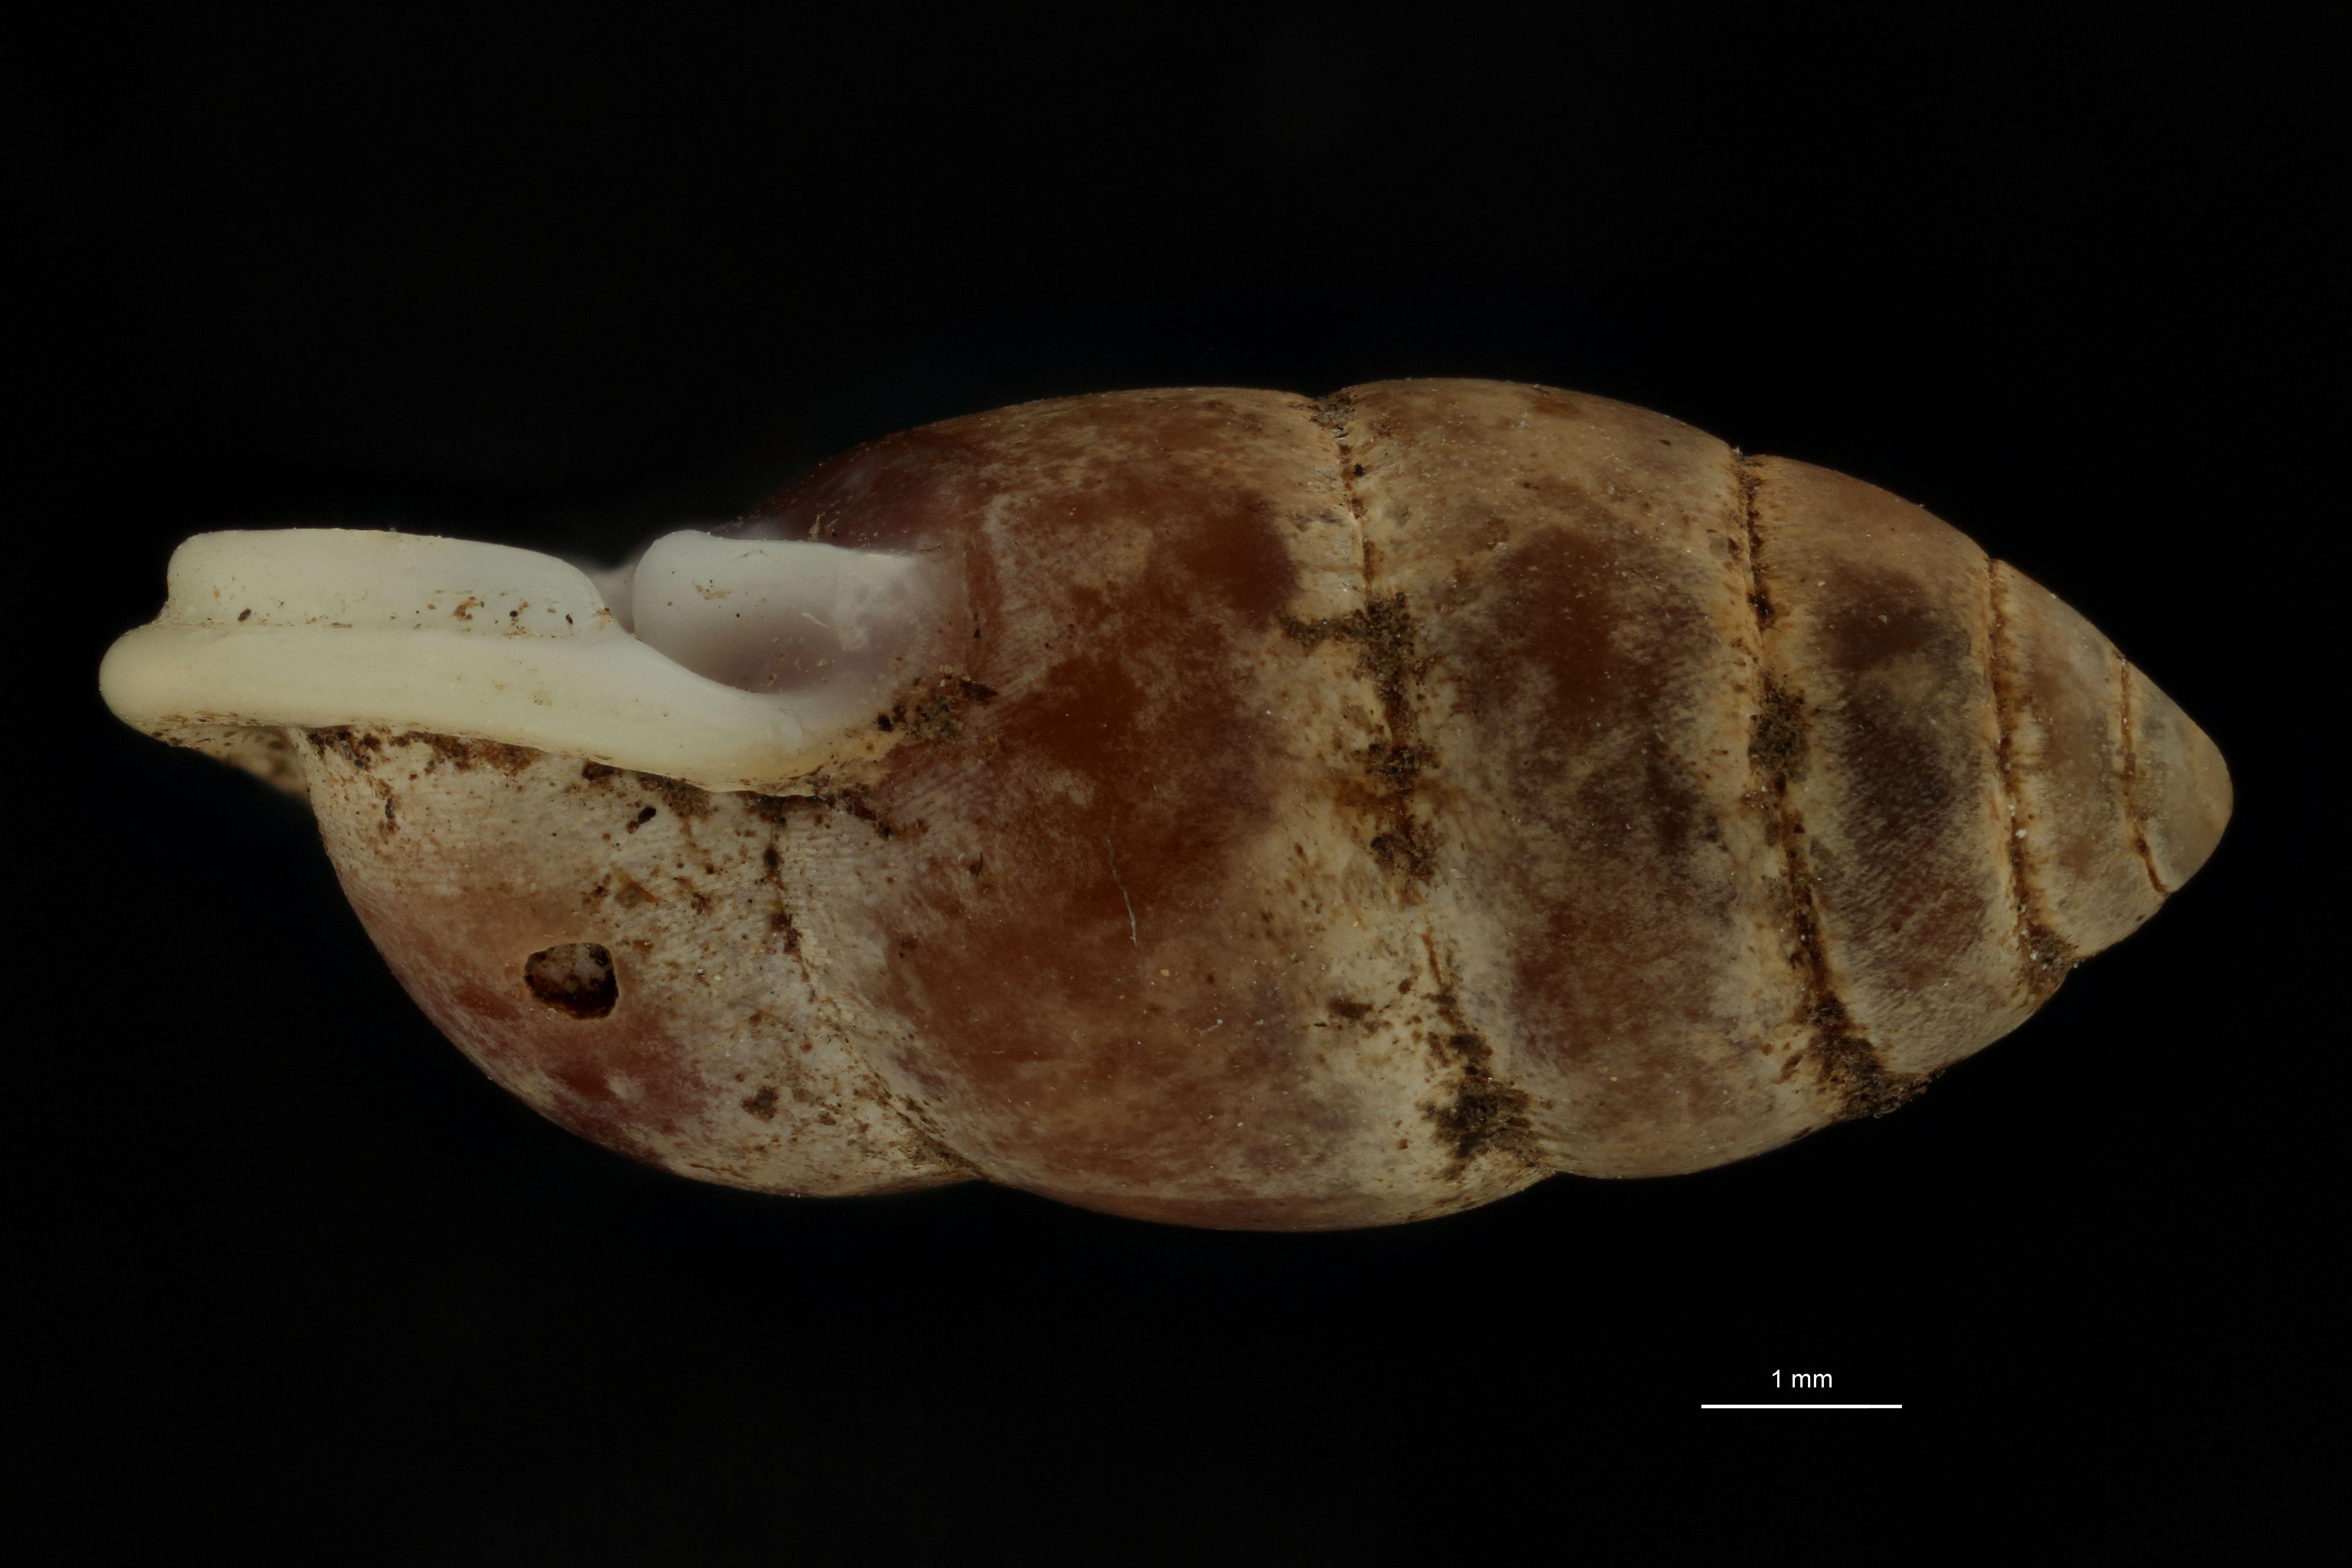 BE-RBINS-INV MT 962 Pupinella (Pupinopsis) swinhoei var. meridionalis pt L.jpg